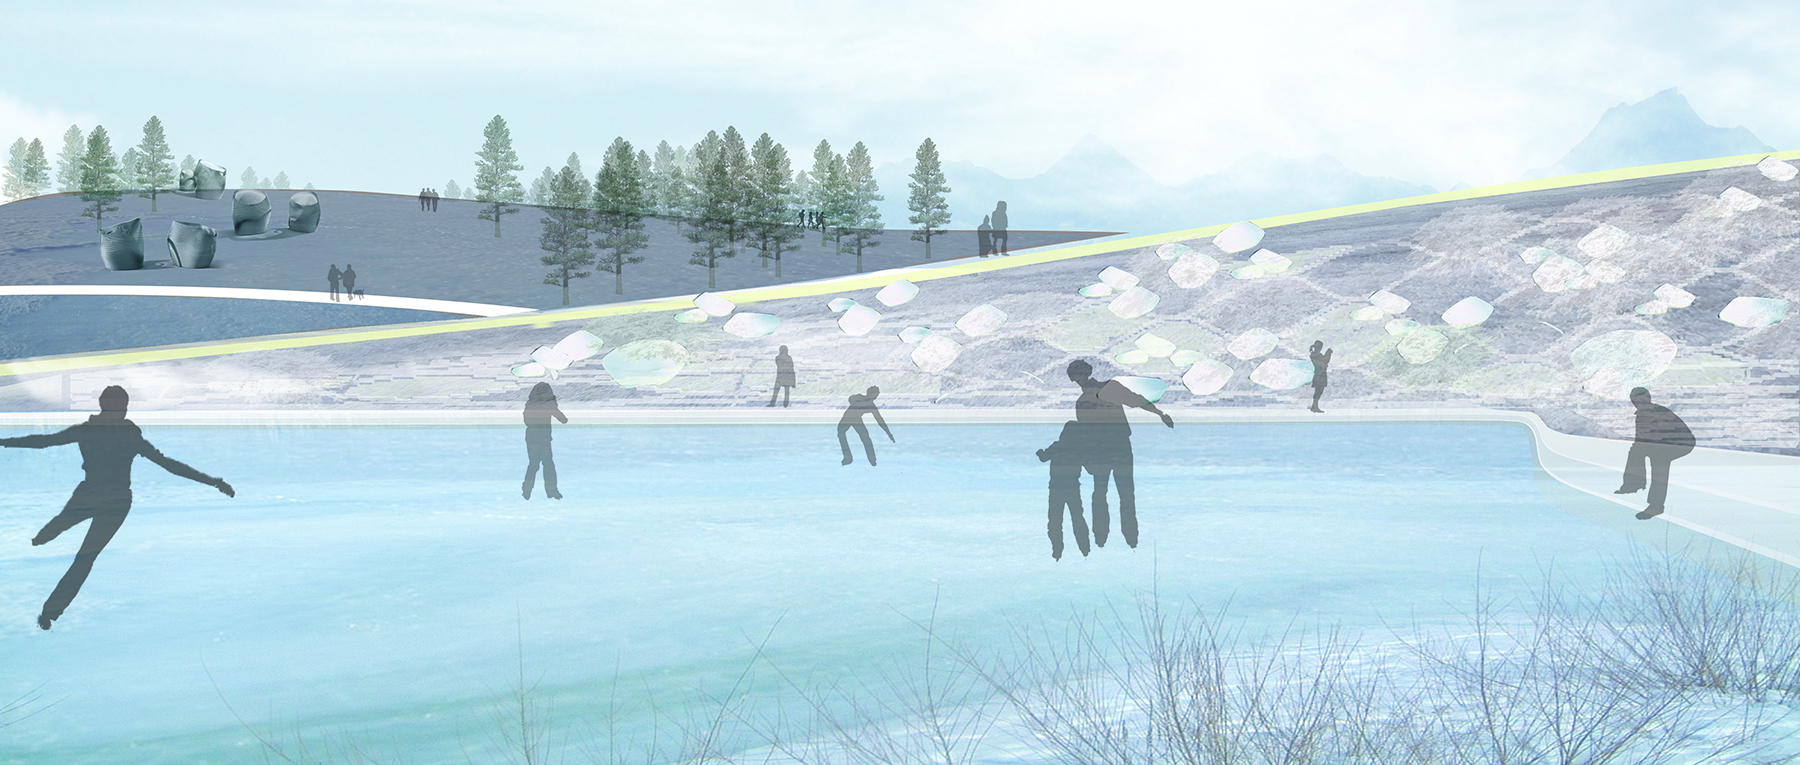 BA_Talgar_SocialPark_WinterScene.jpg